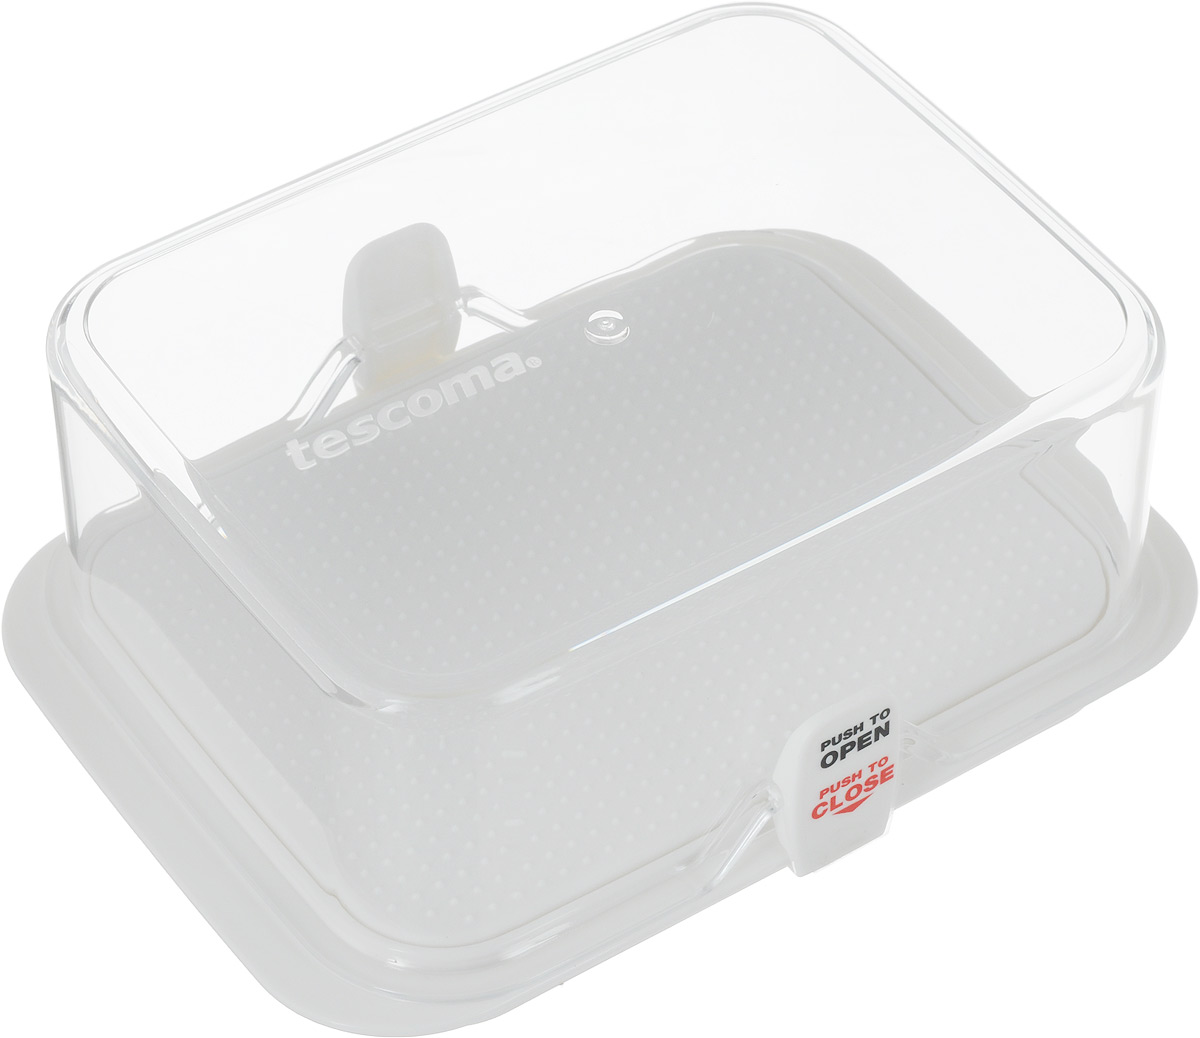 Kонтейнер для холодильника Tescoma Purity, 14 х 11 х 6,5. 891830